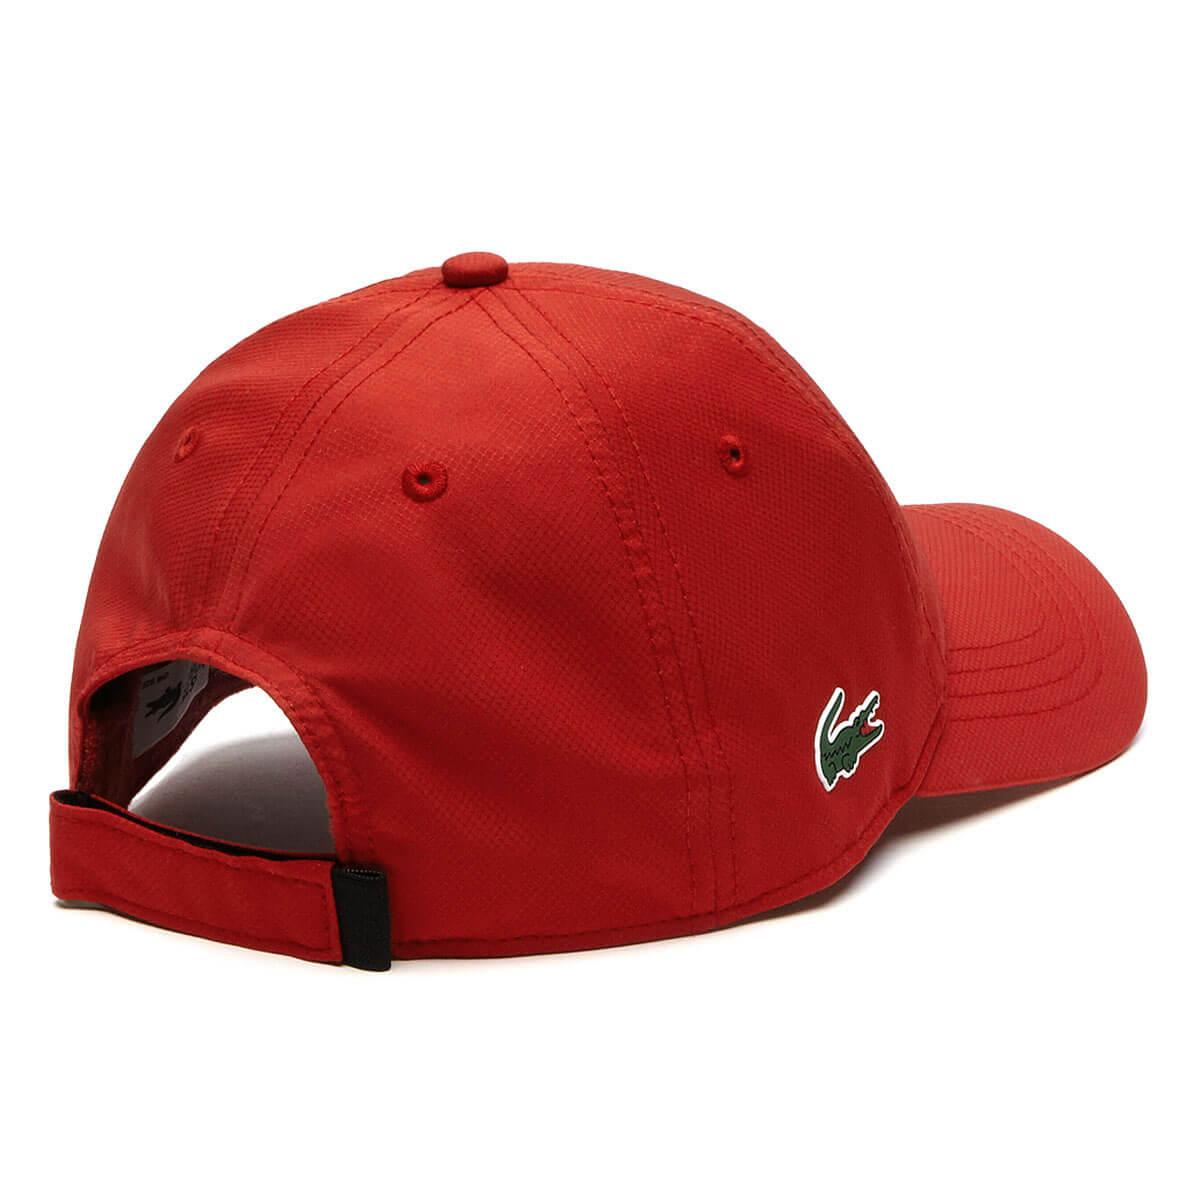 162a612f806 Lacoste Mens 2019 RK2447 Sports Weave Taffeta Solid Diamond Baseball ...